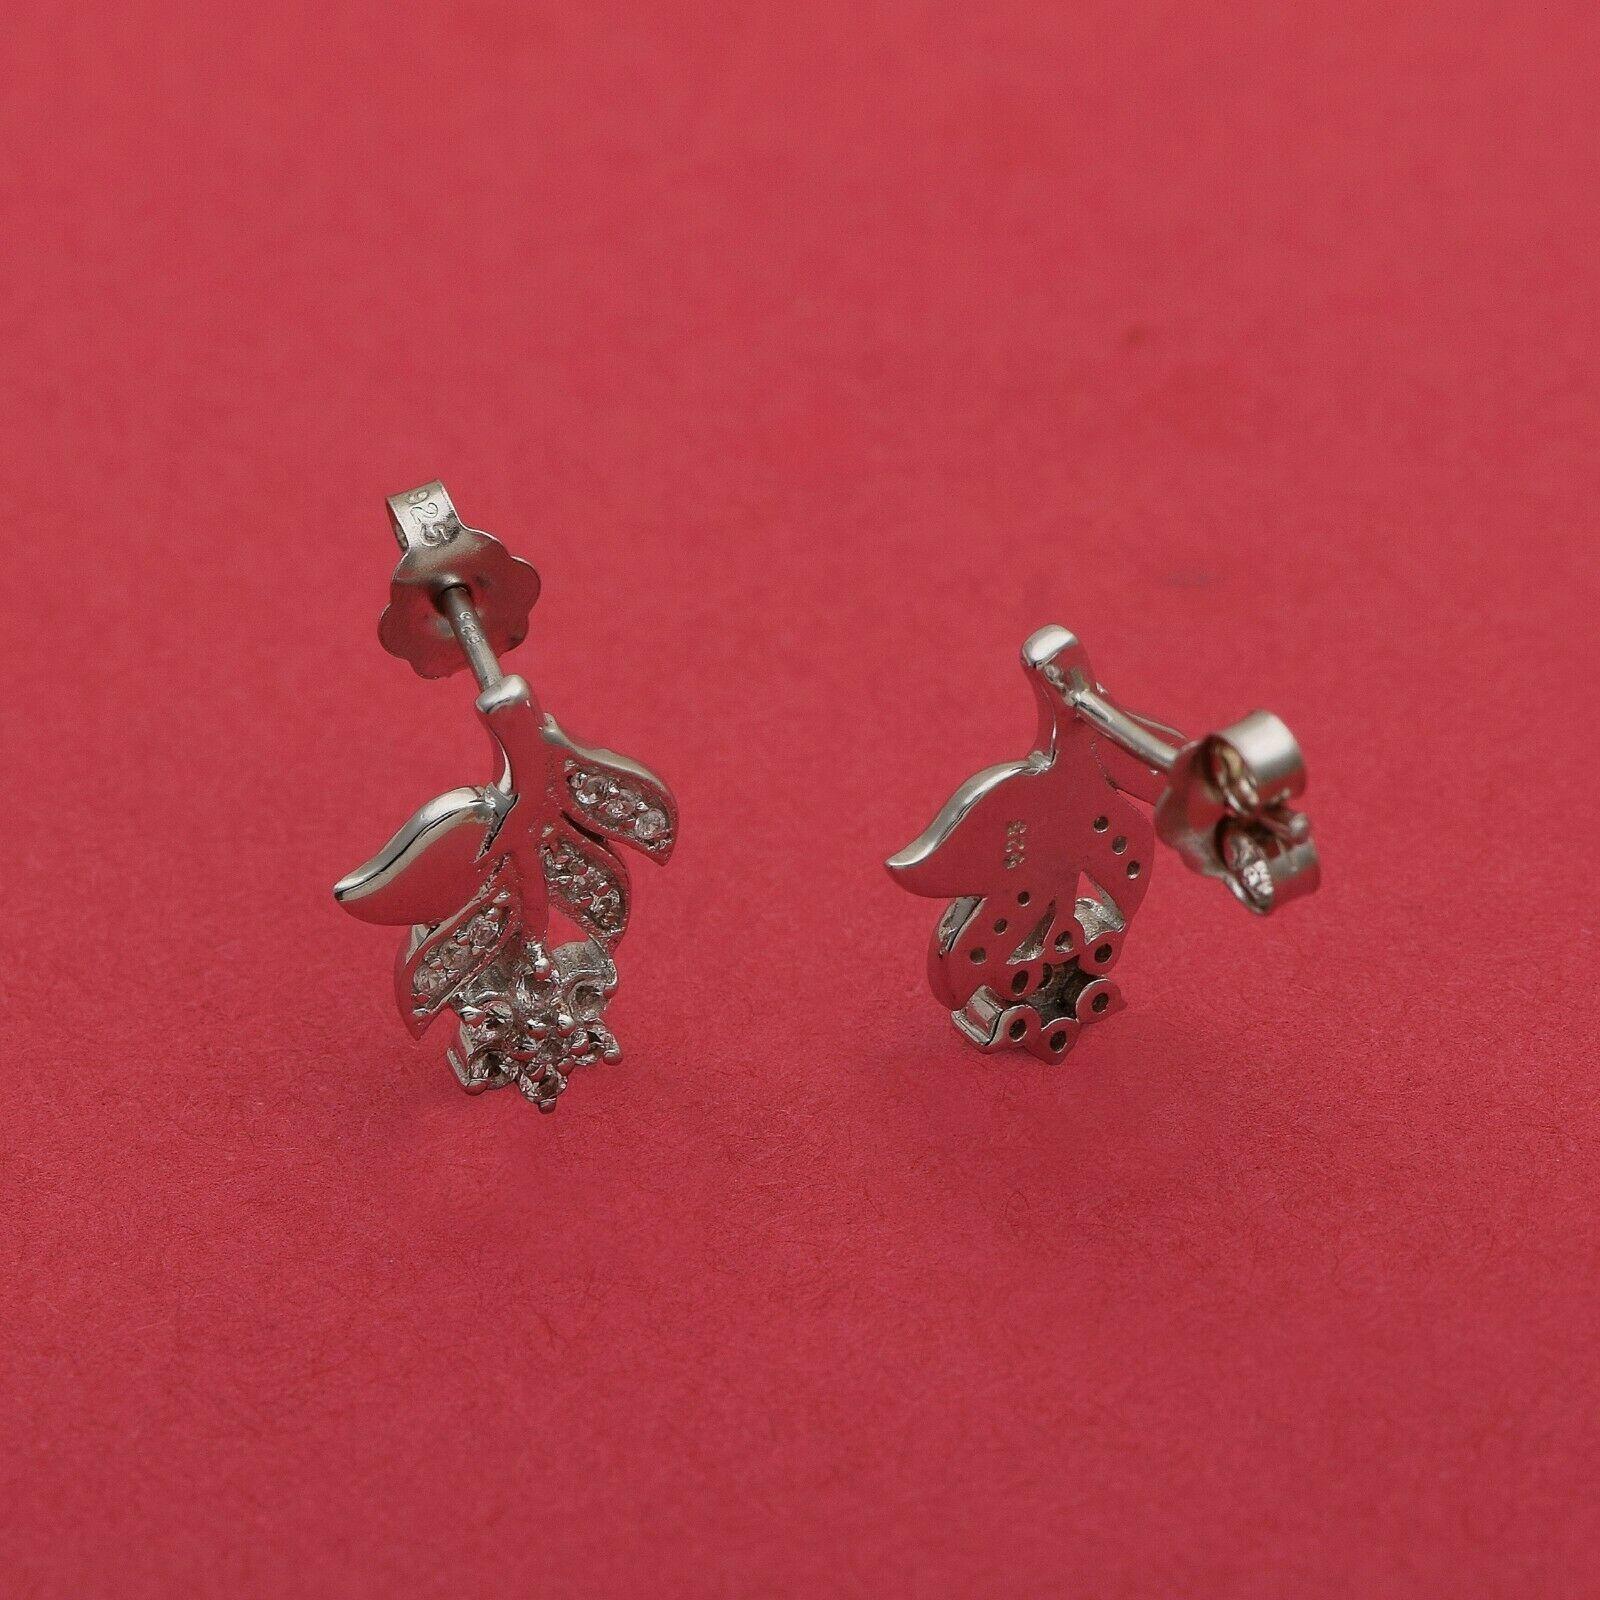 Solid 925 Sterling Silver Leaf Shape Star White Topaz Gems Nature Inspired Stud